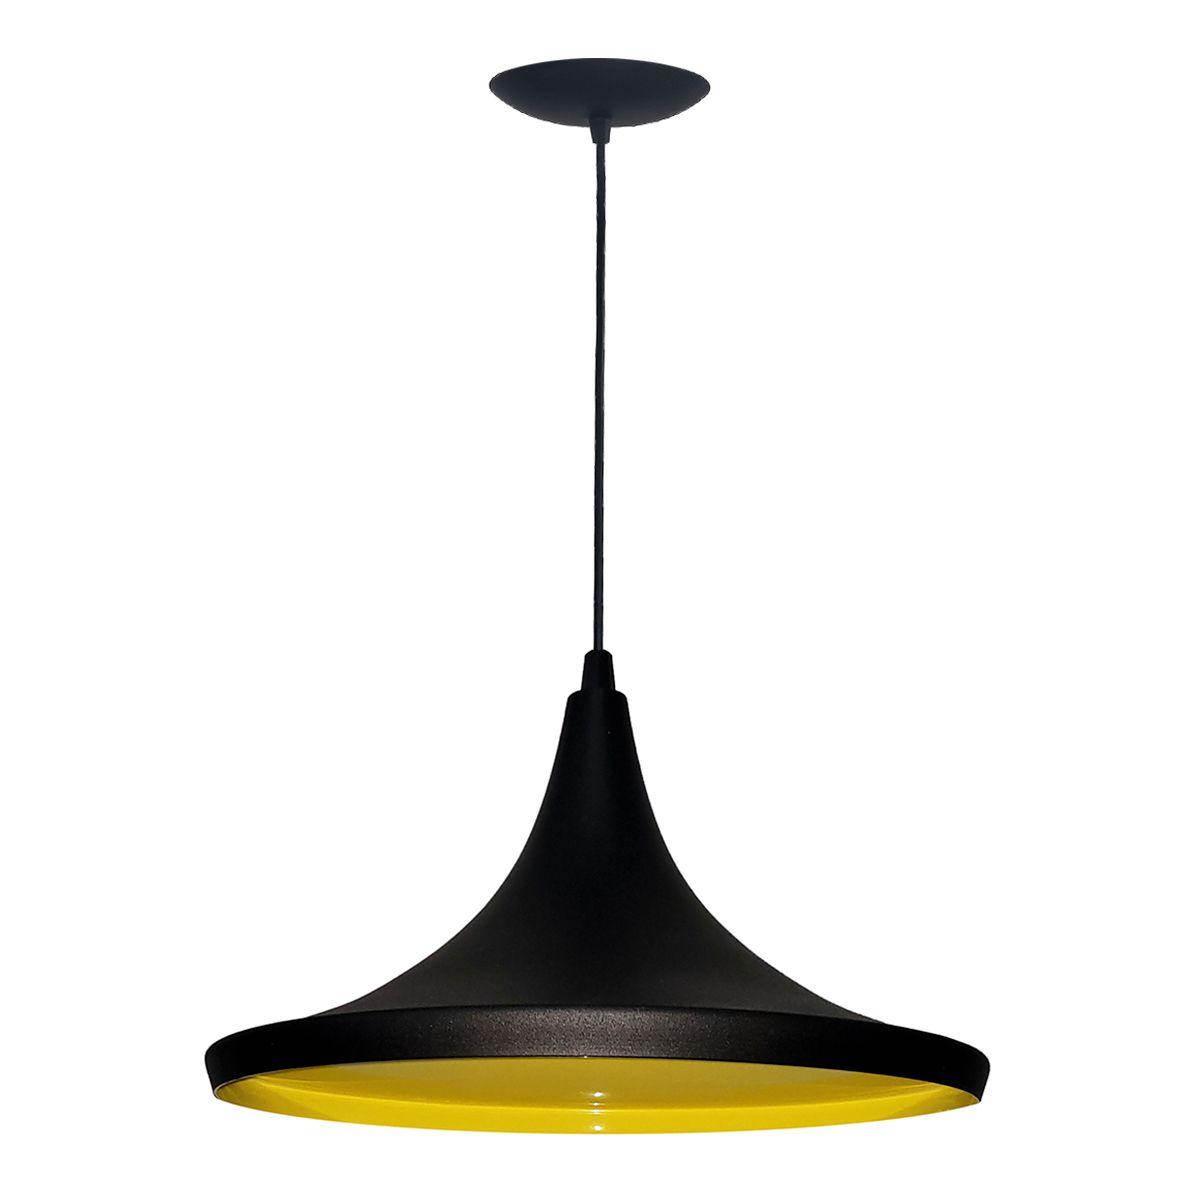 Luminária Decorativa Prato Chinês 27 Preto/Amarelo Pendente